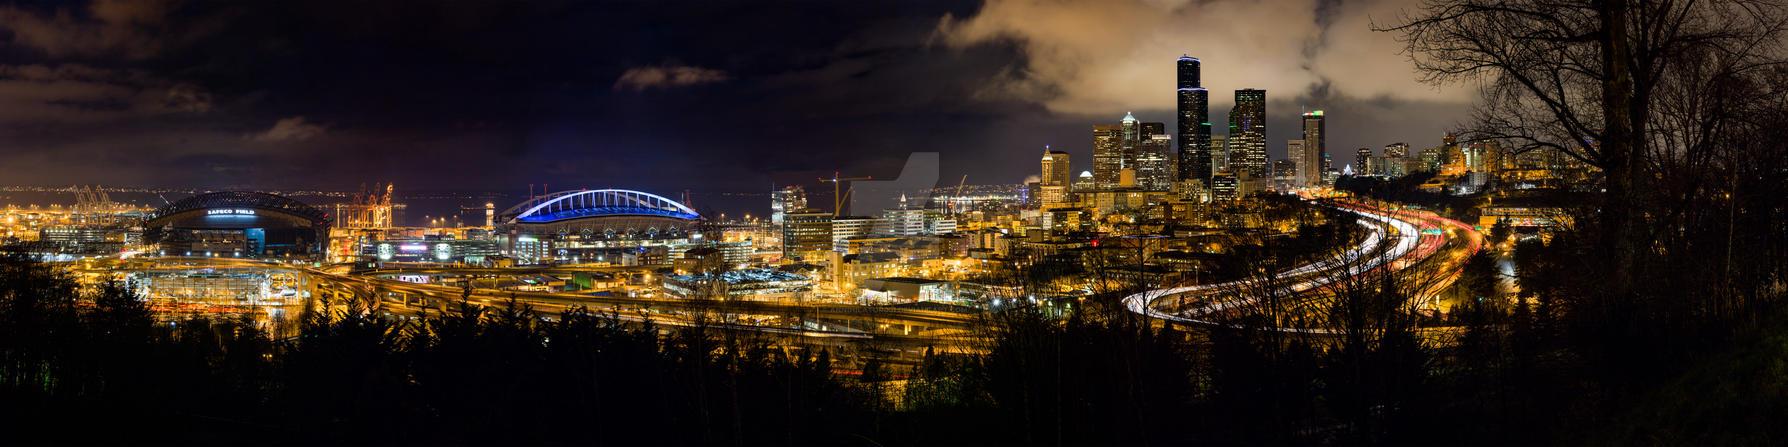 Seattle Washington by ANNIHILATOR001